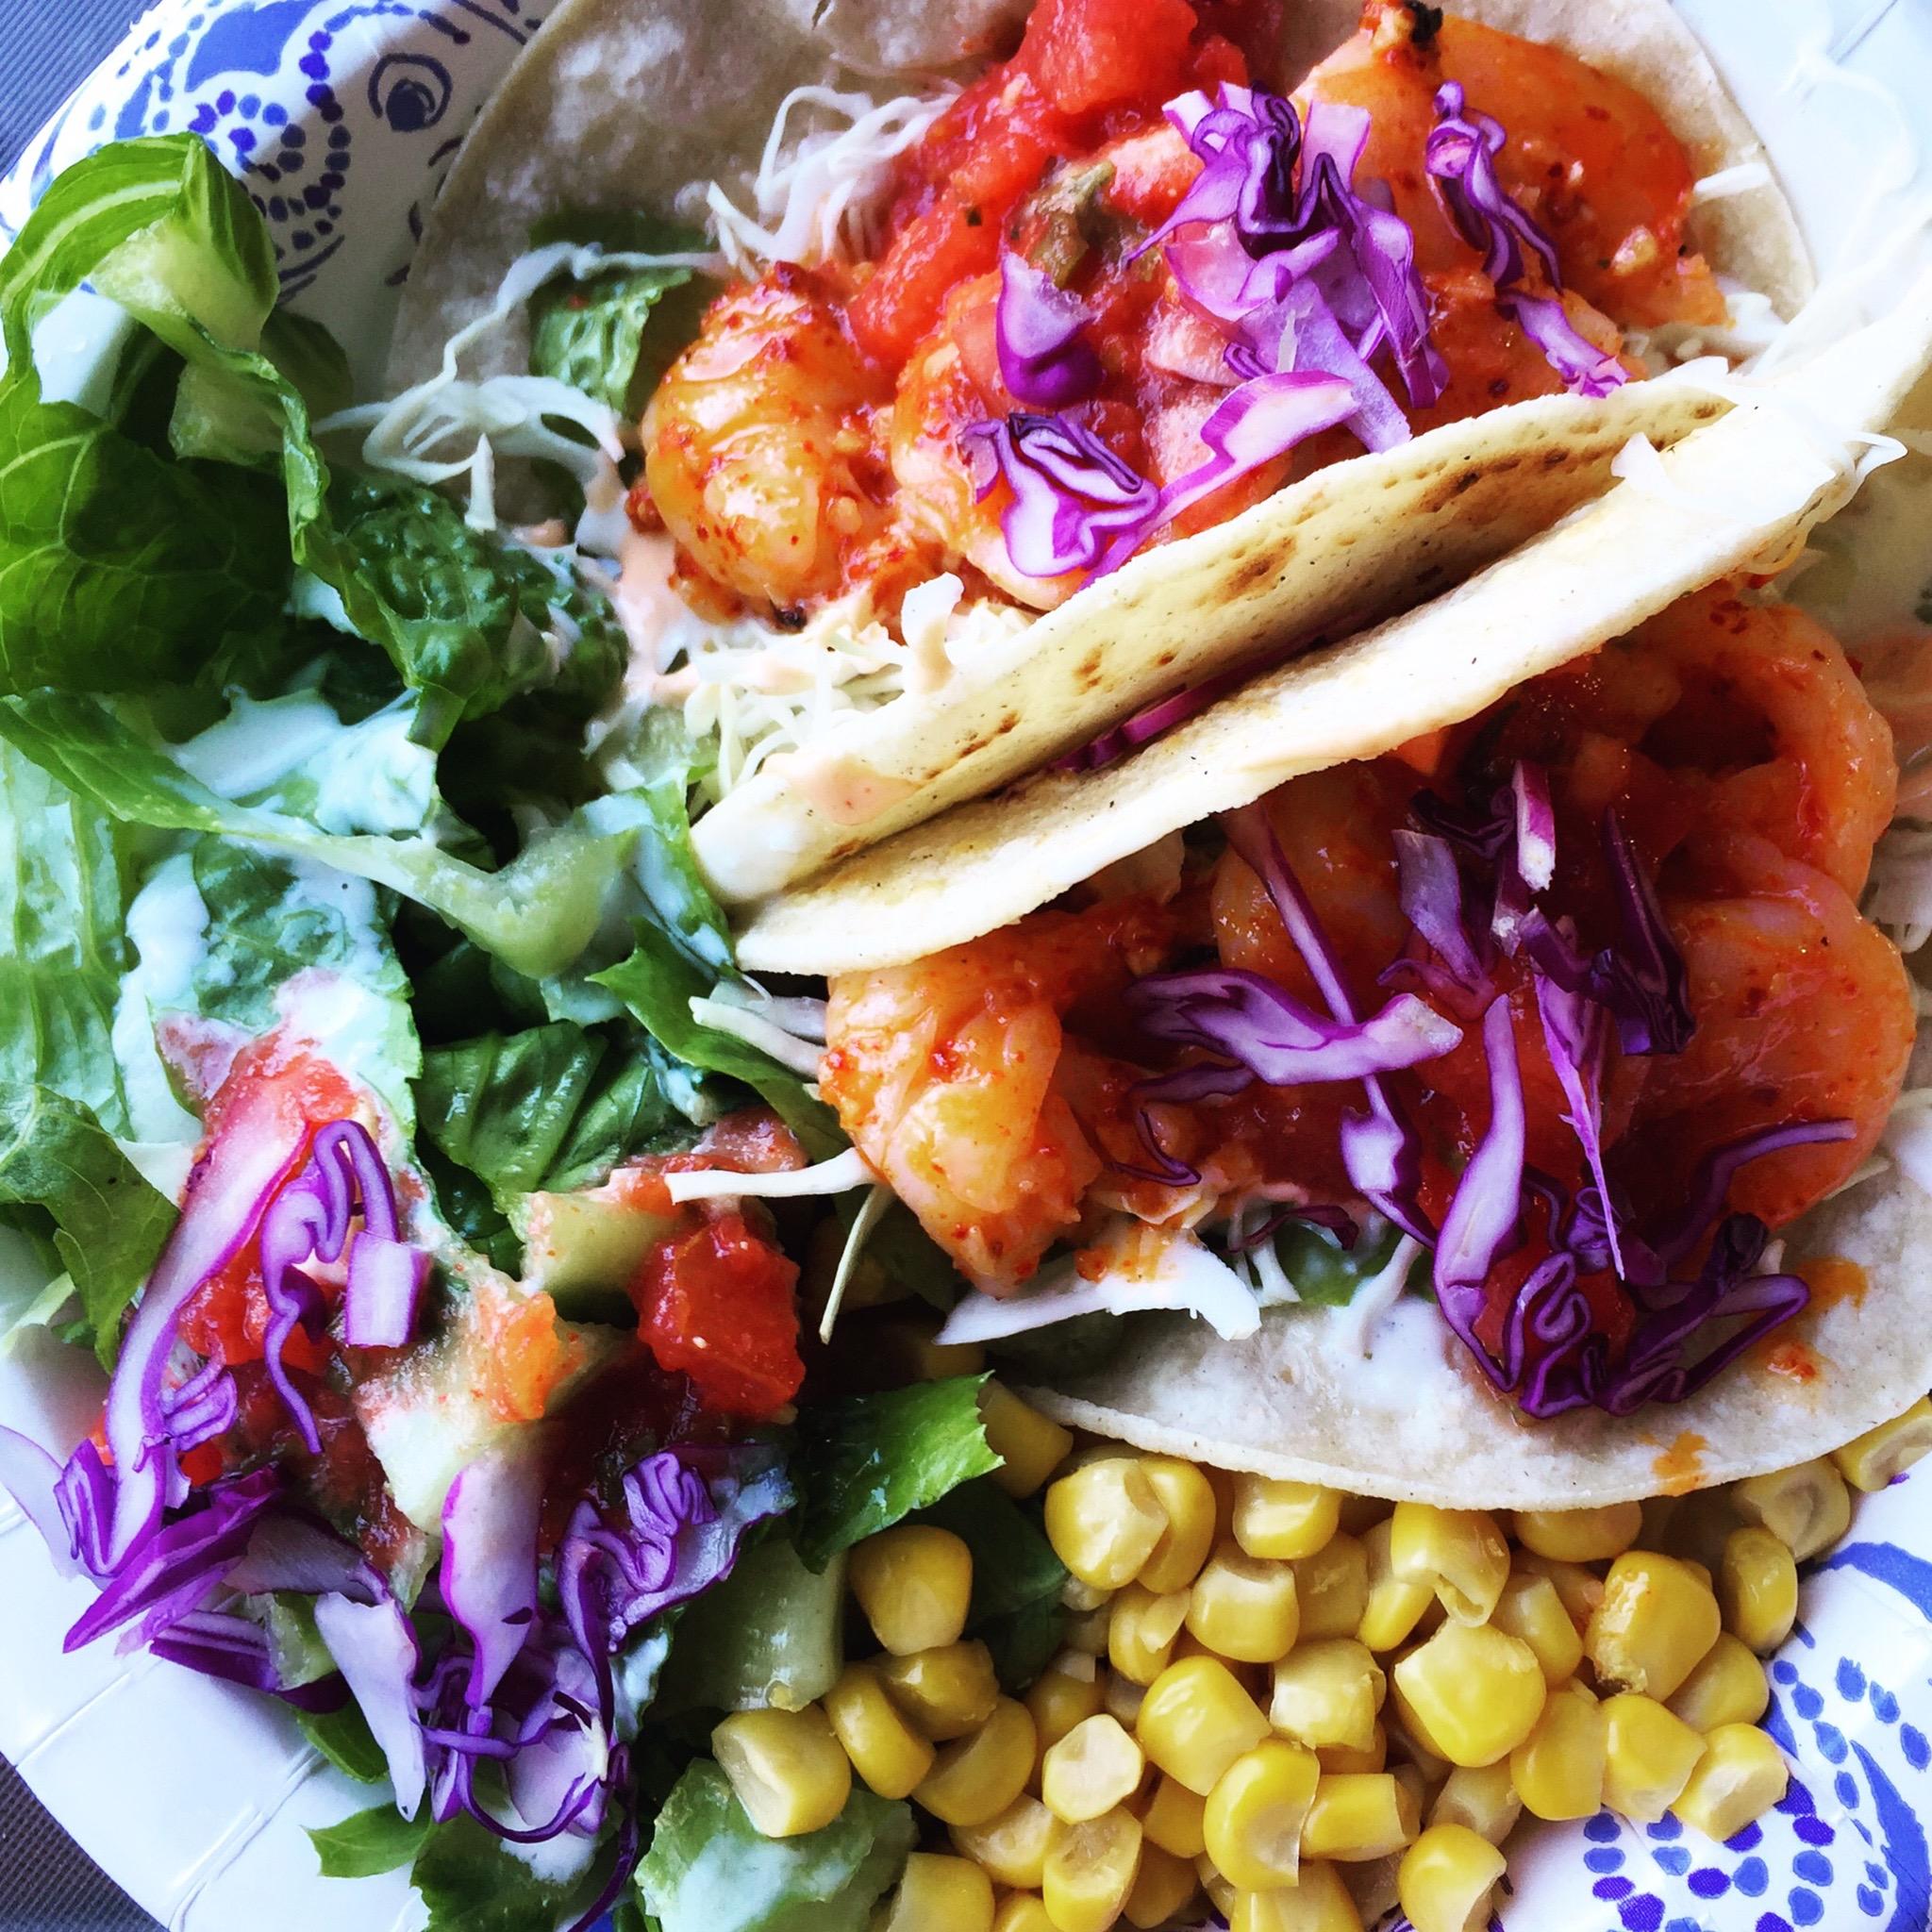 Kauai Food Truck shrimp tacos